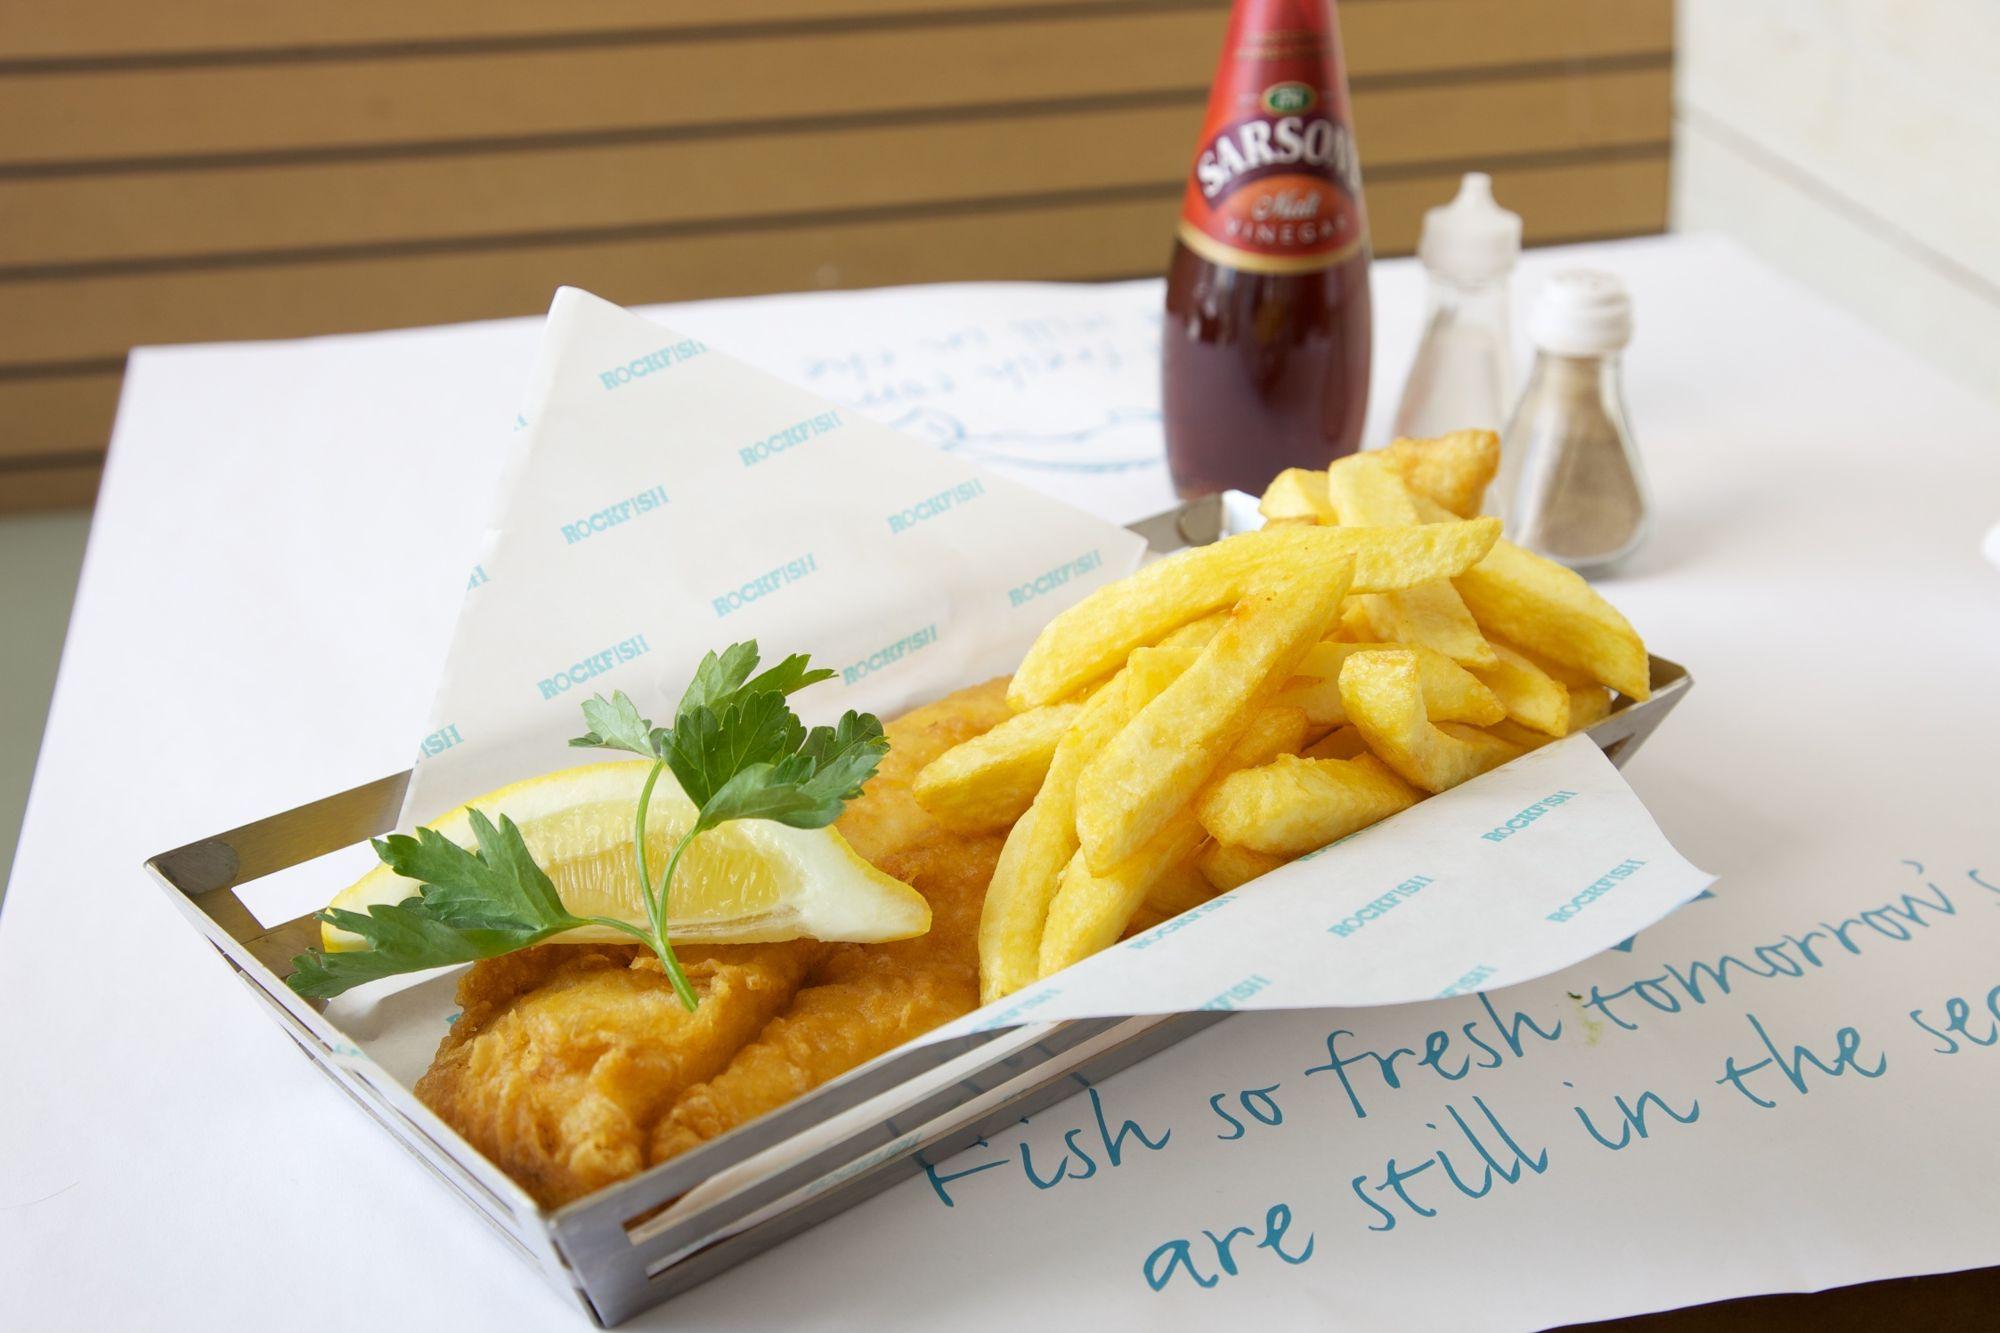 RockFish Seafood & Chips